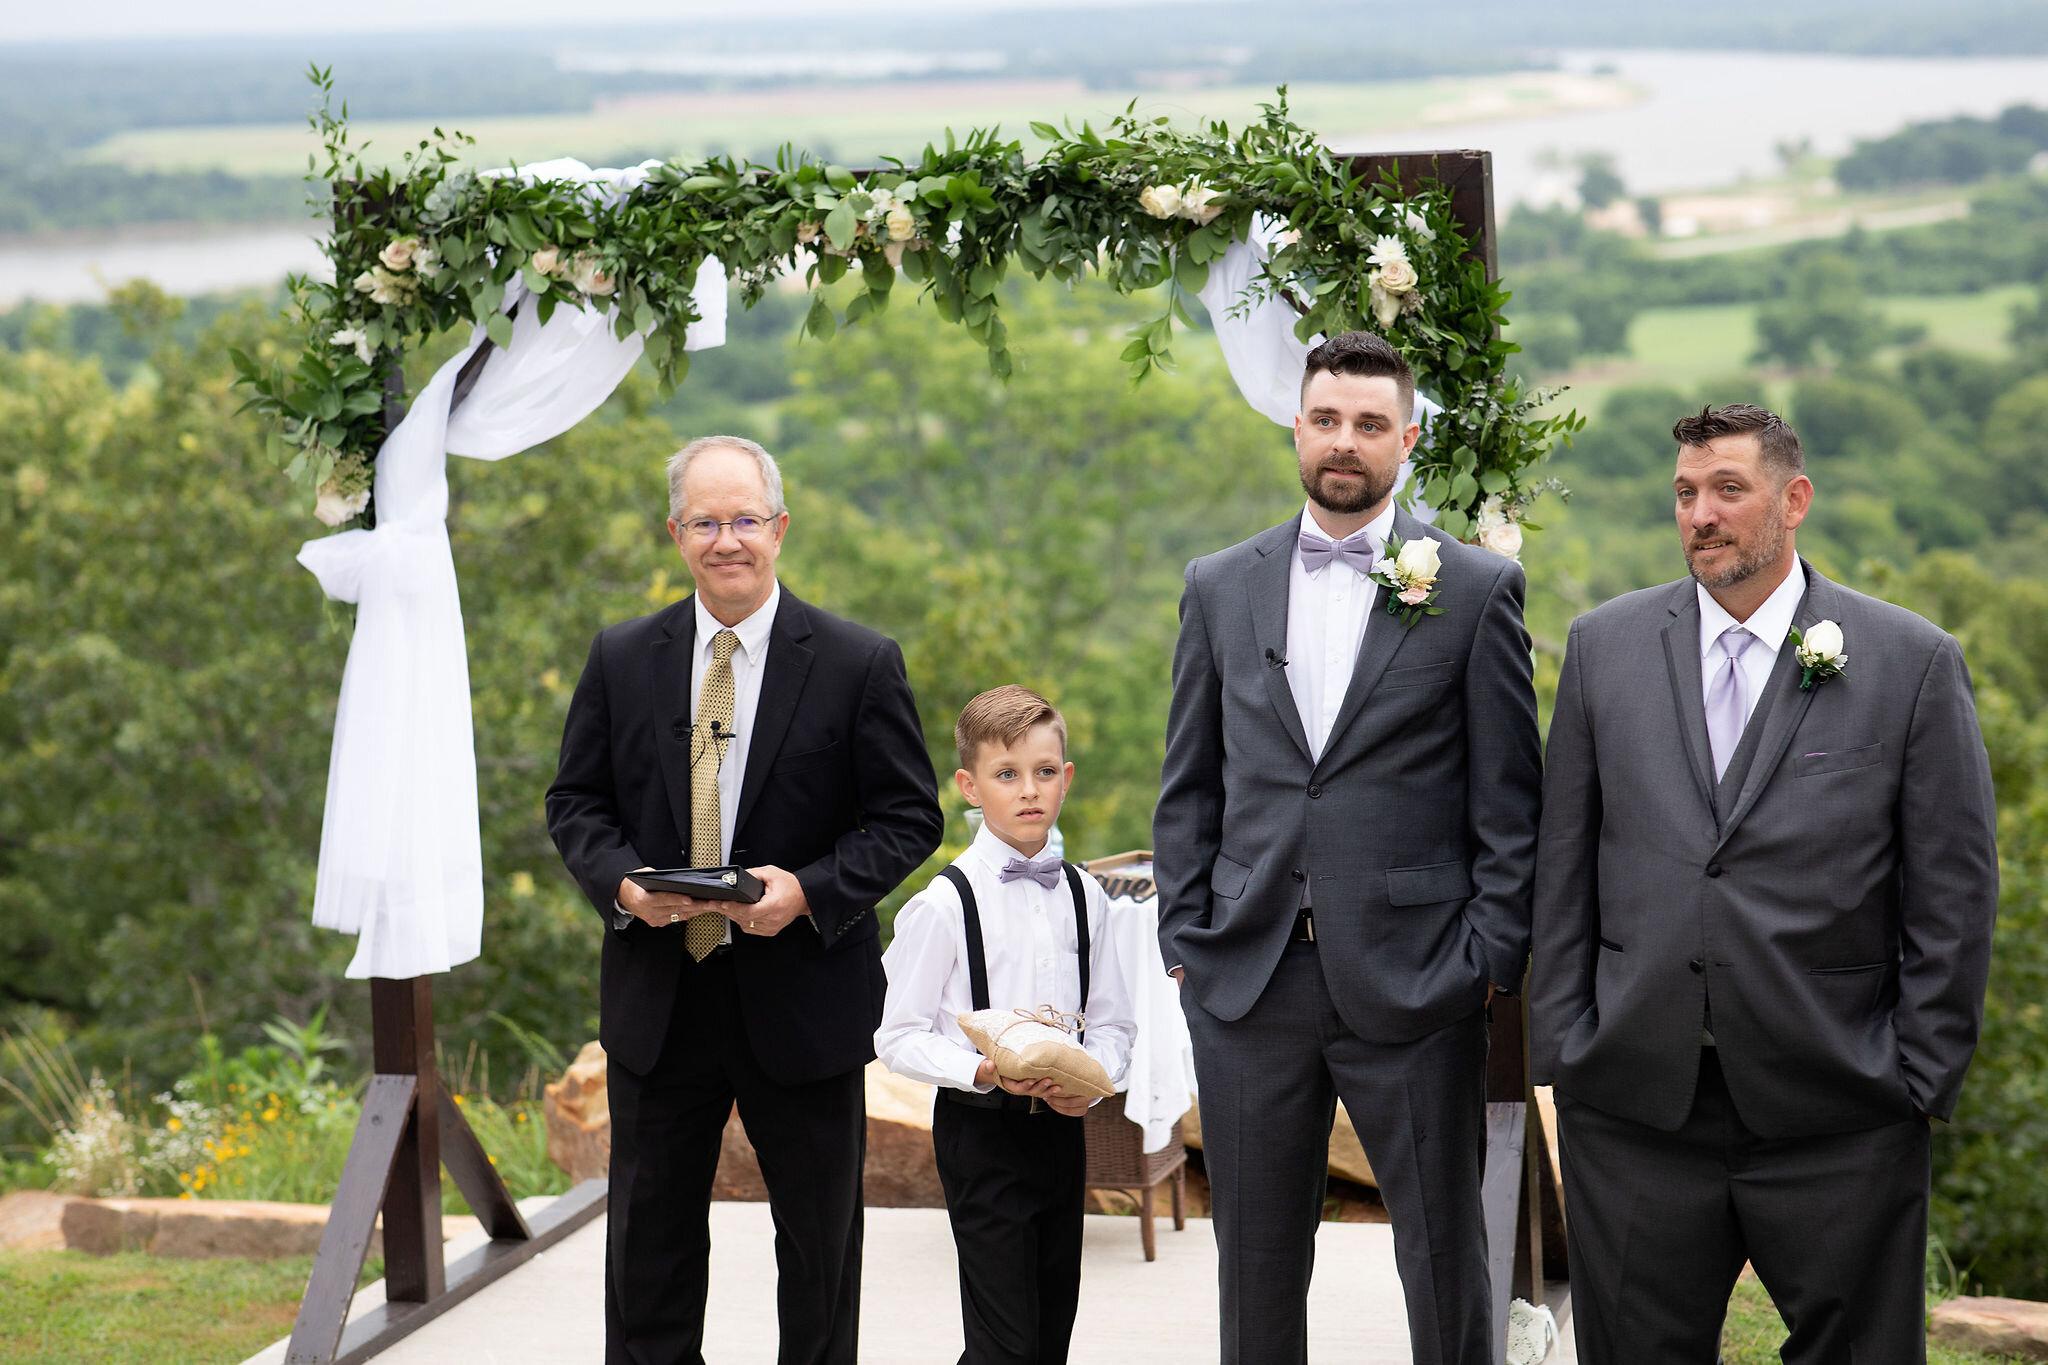 Oklahoma Summer Wedding Venue Dream Point Ranch 27a.jpg